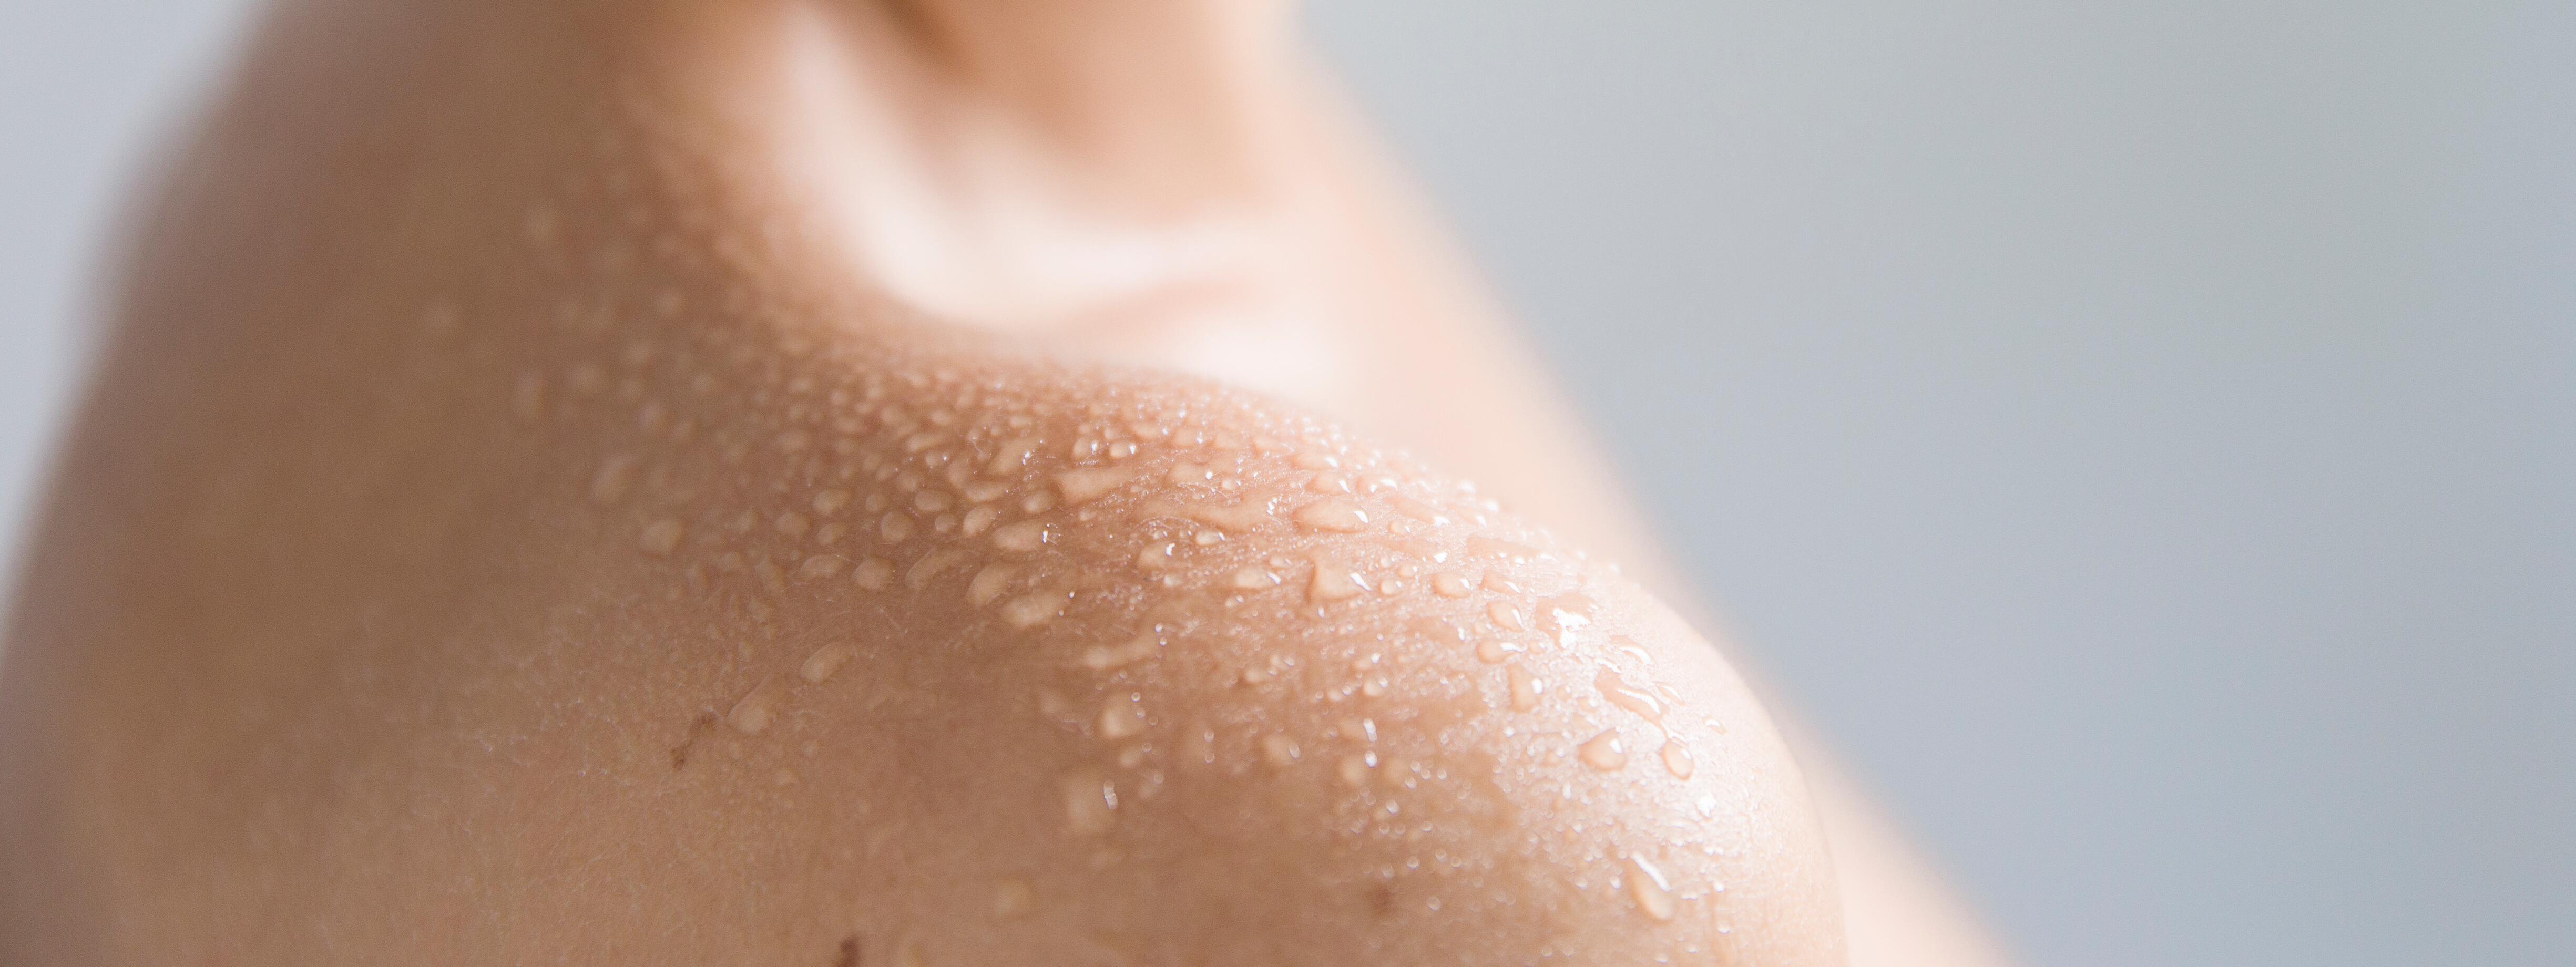 av_instit-thermal-water-skin2-hdrvb